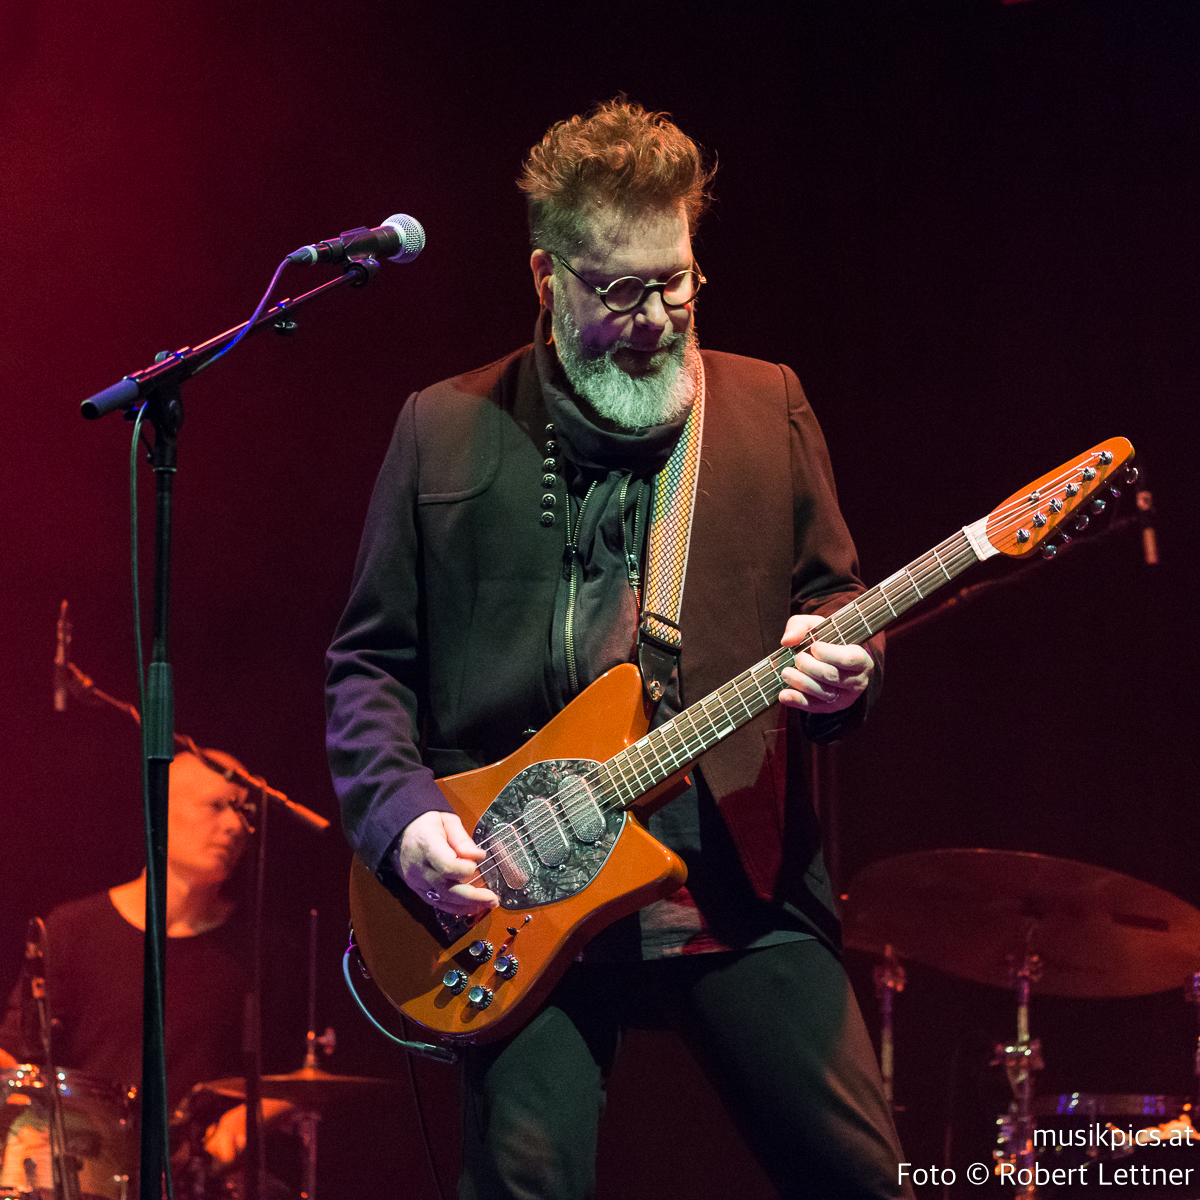 Robert-Lettner-Musikpics-Live-Music-Photography-Jarmo-Saari-Republic-DSC01207